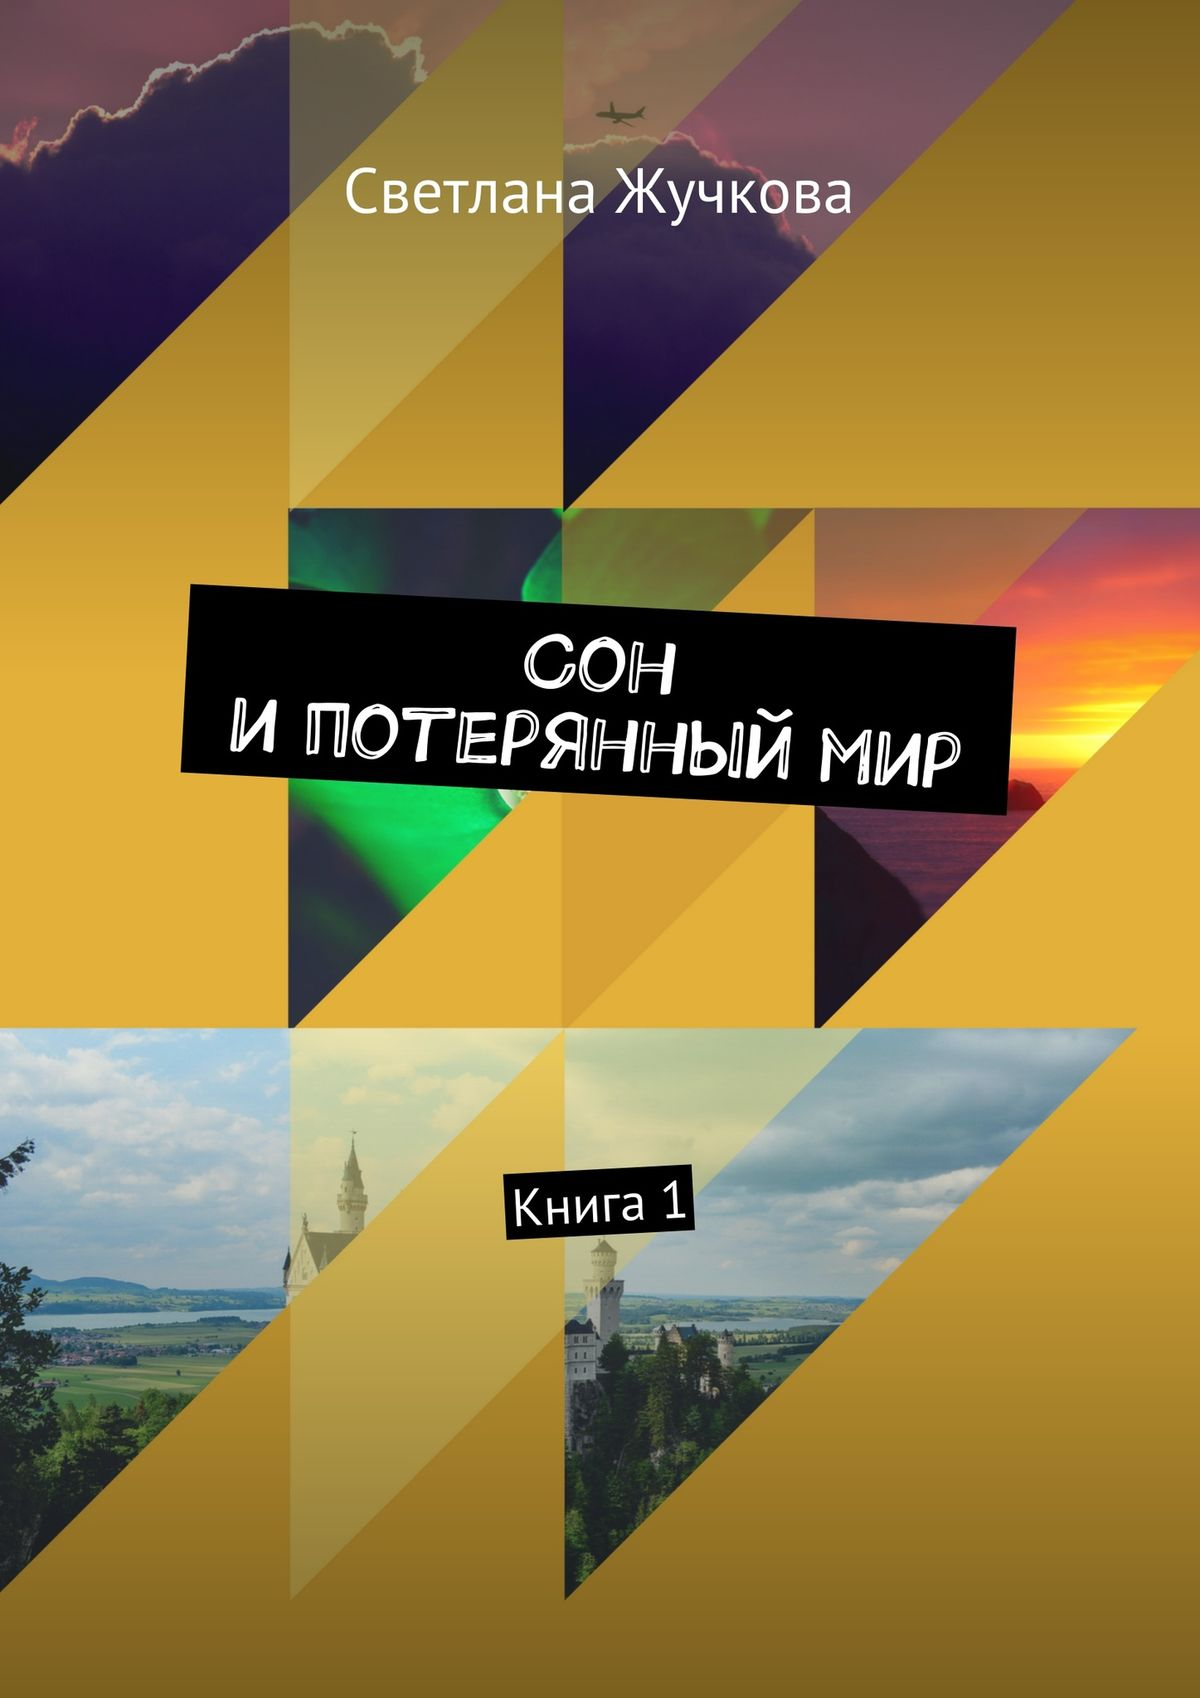 Светлана Андреевна Жучкова Сон ипотерянныймир. Книга 1